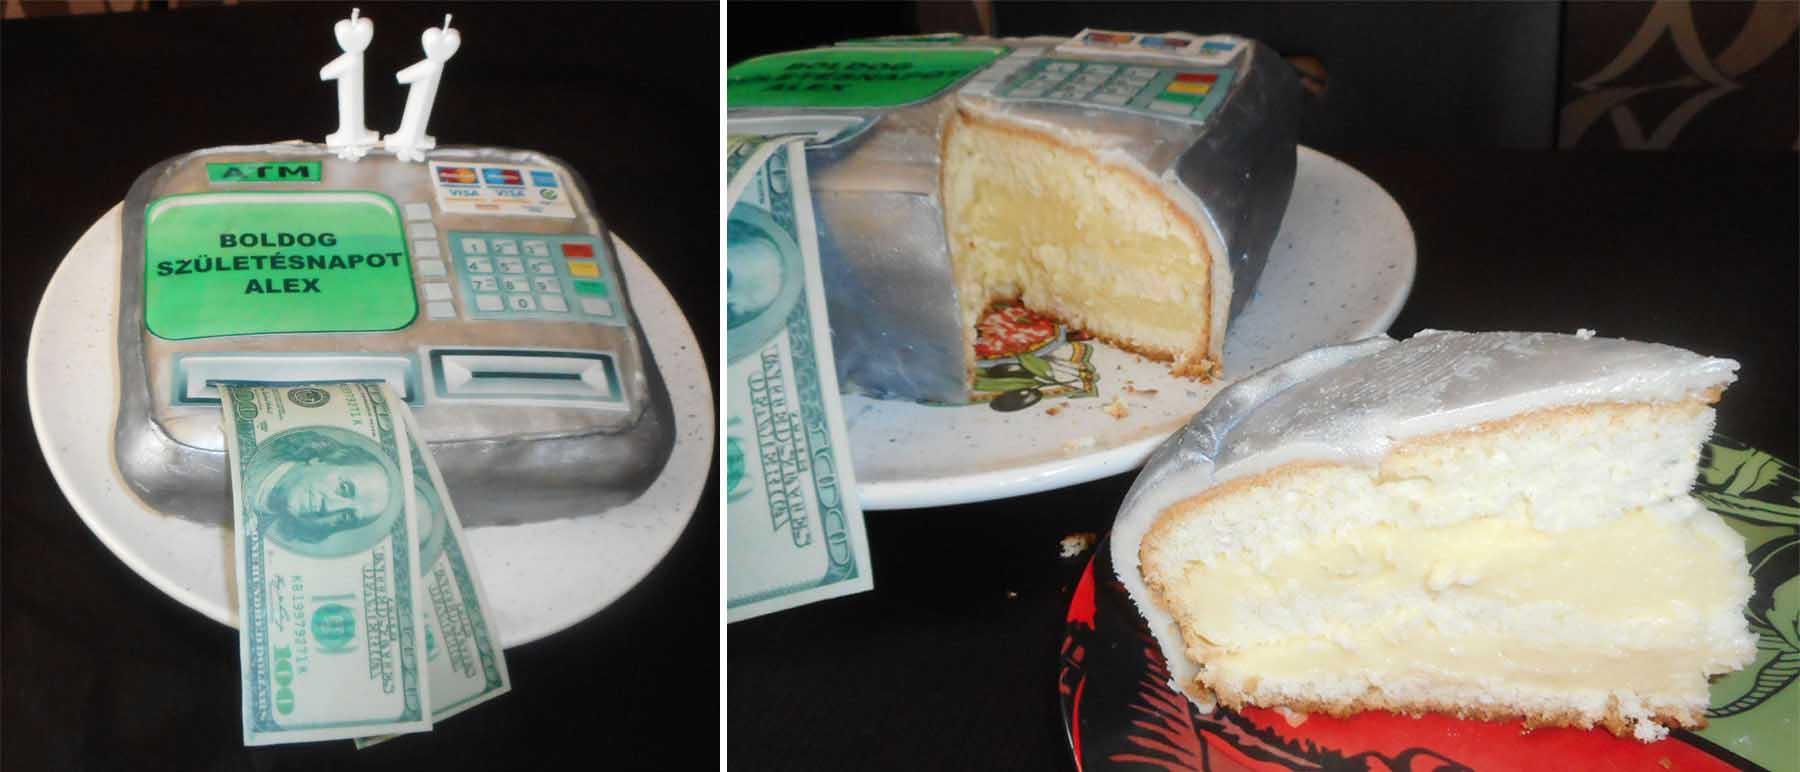 Vaníliás-marcipános torta ATM-re formázva